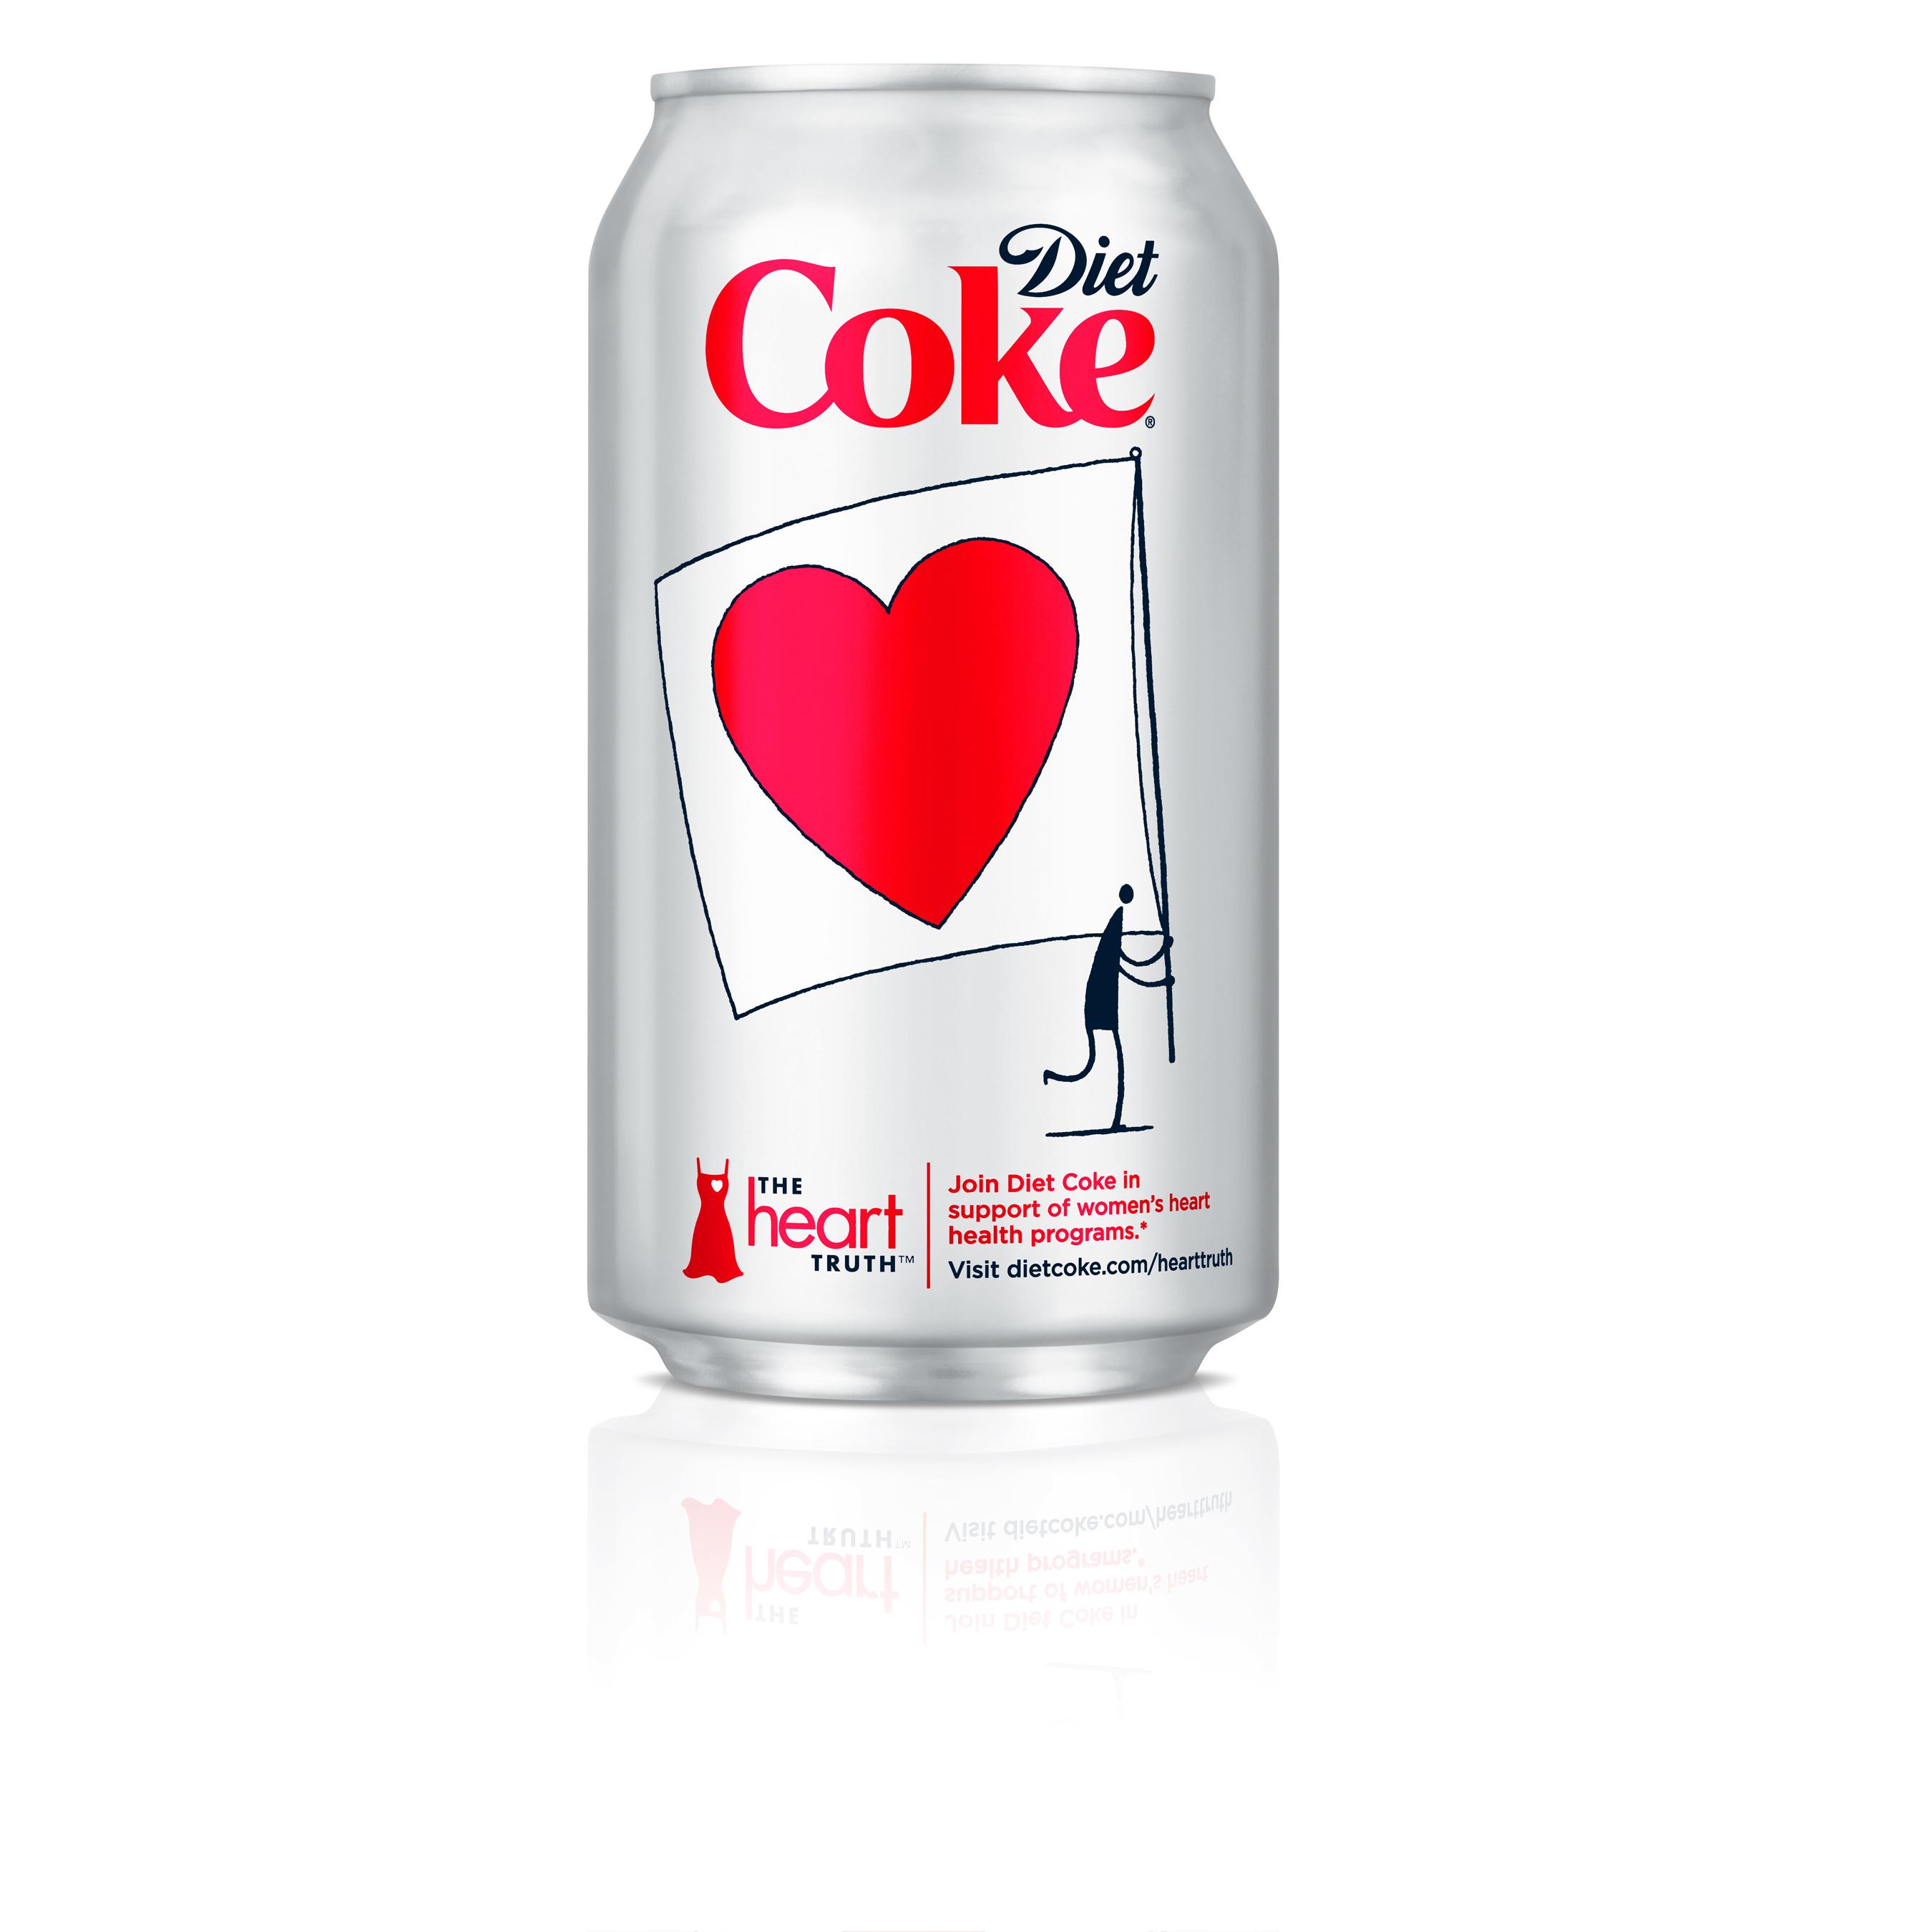 DIET COKE® AND HEIDI KLUM WAVE A FLAG FOR WOMEN'S HEART HEALTH